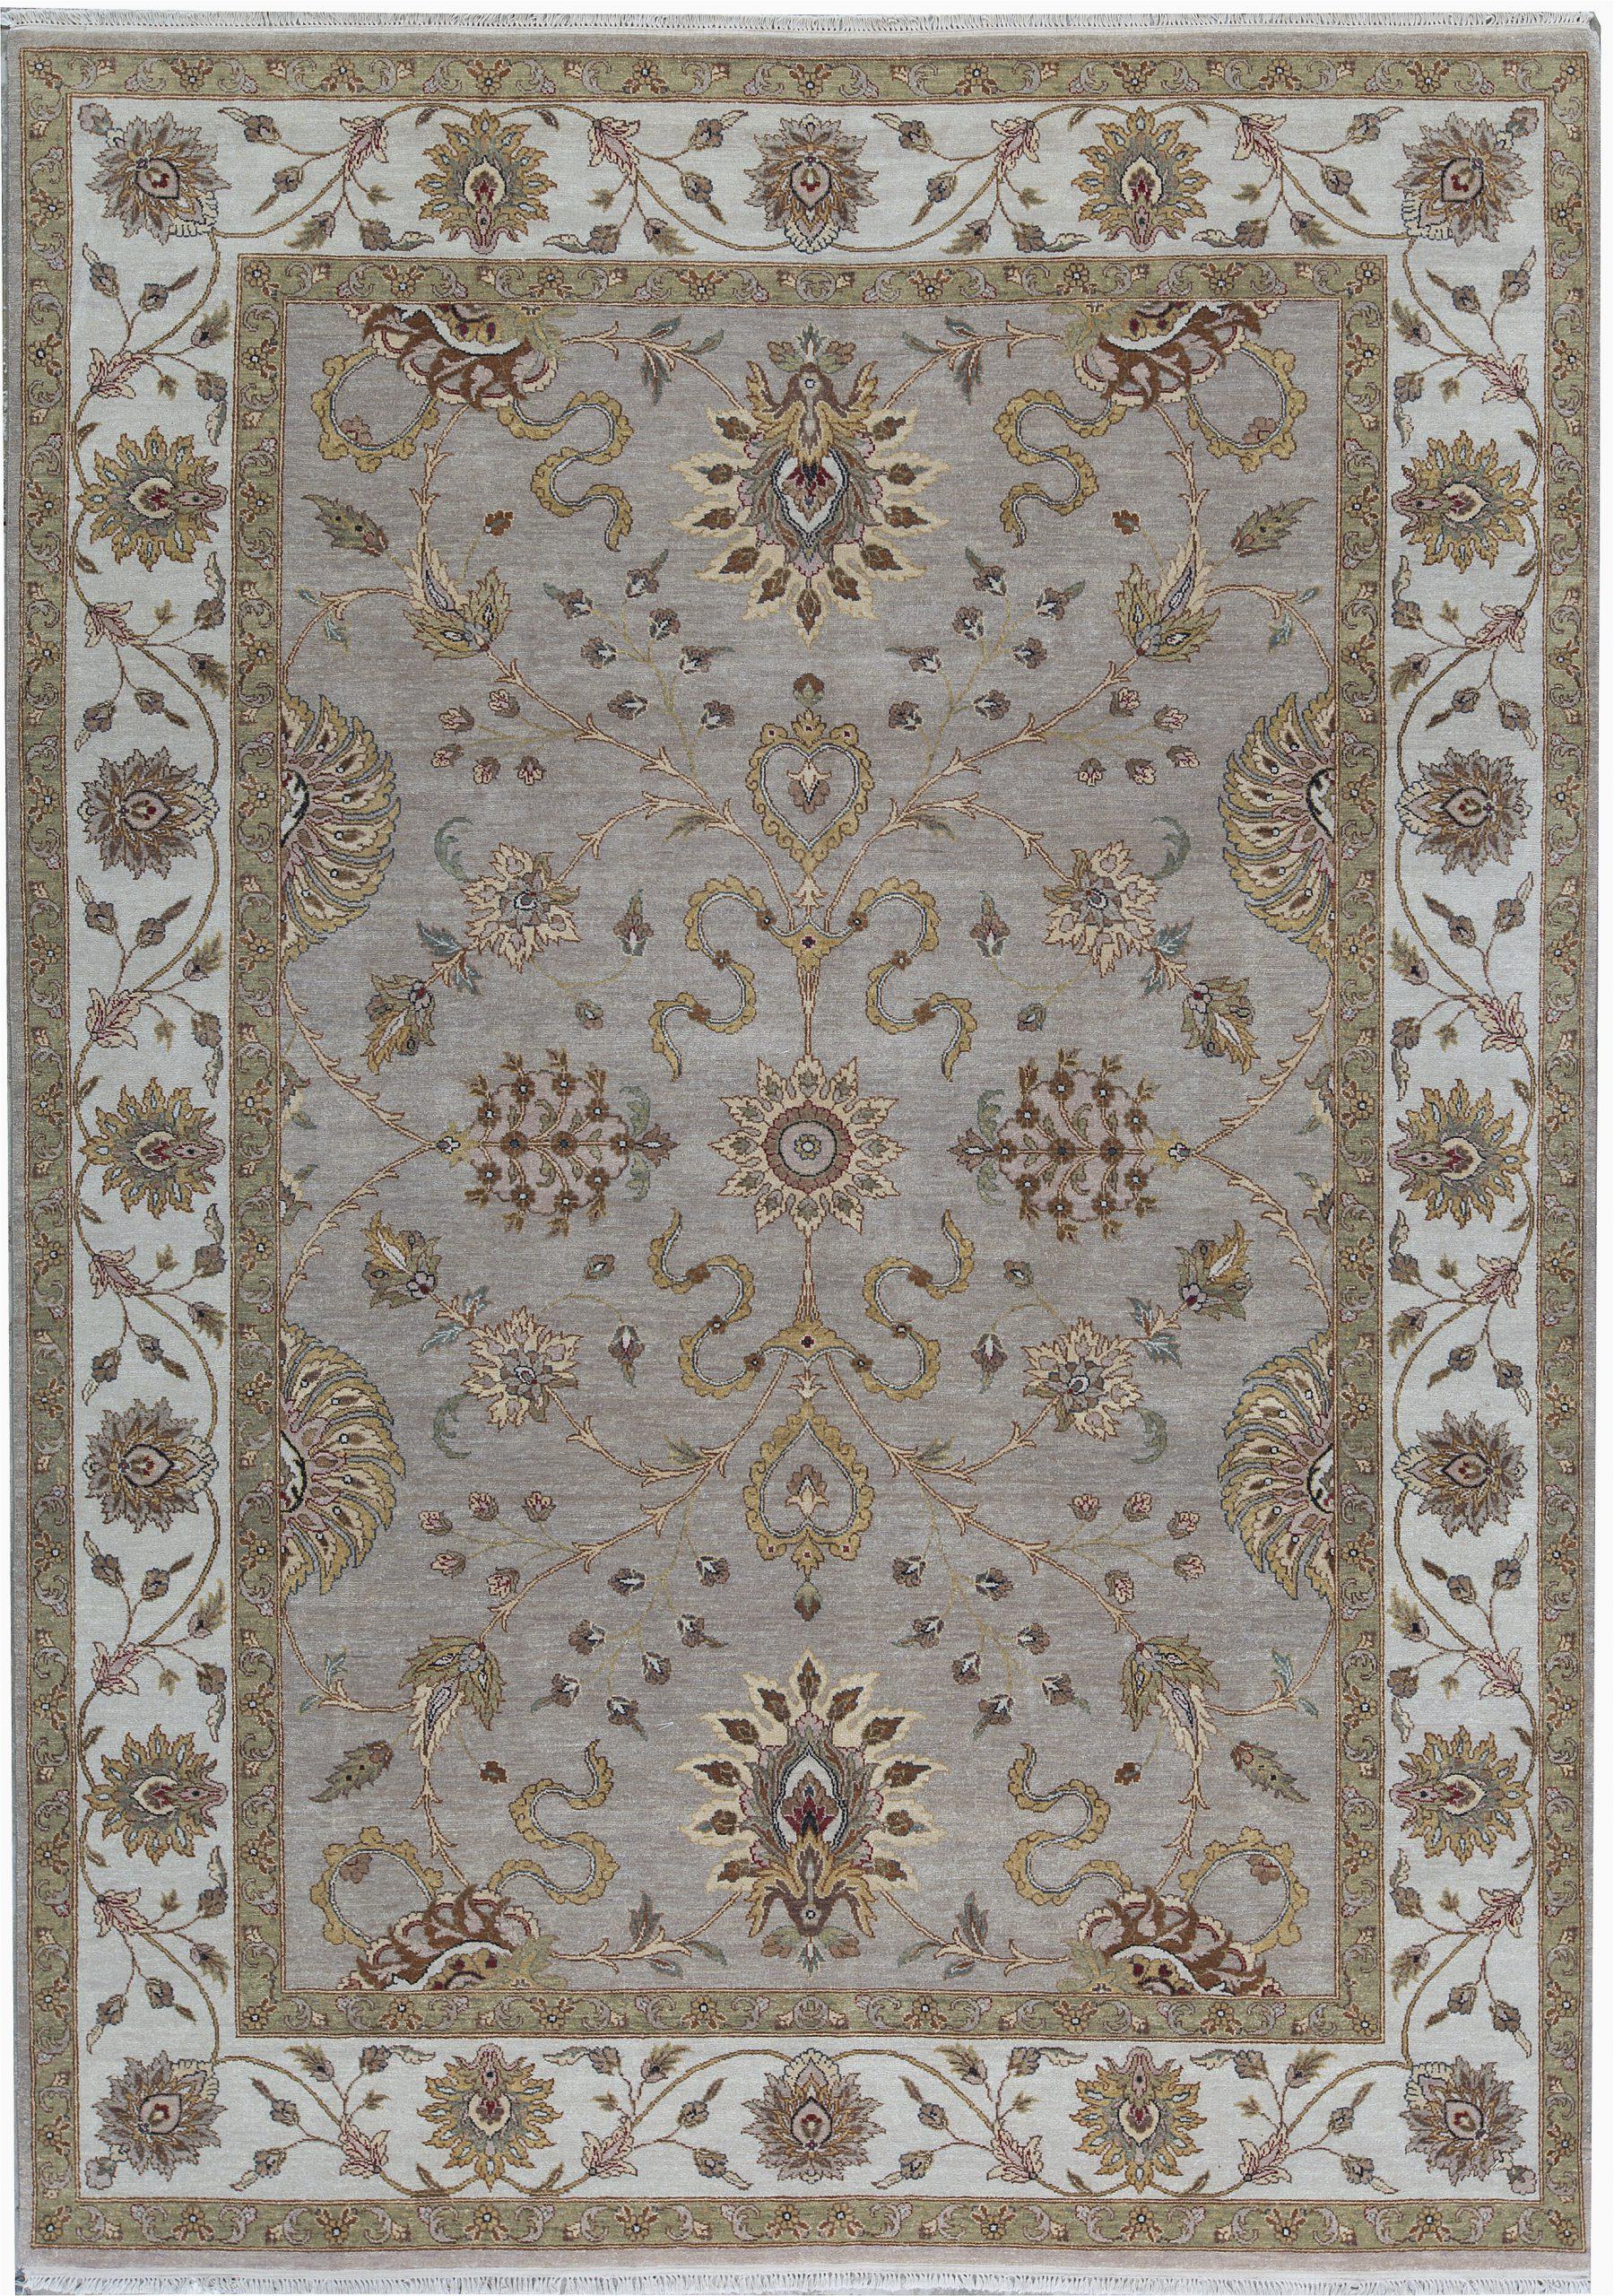 bokara rug co inc one of a kind cornwall hand knotted 911 x 1310 wool silver area rug abhd7114